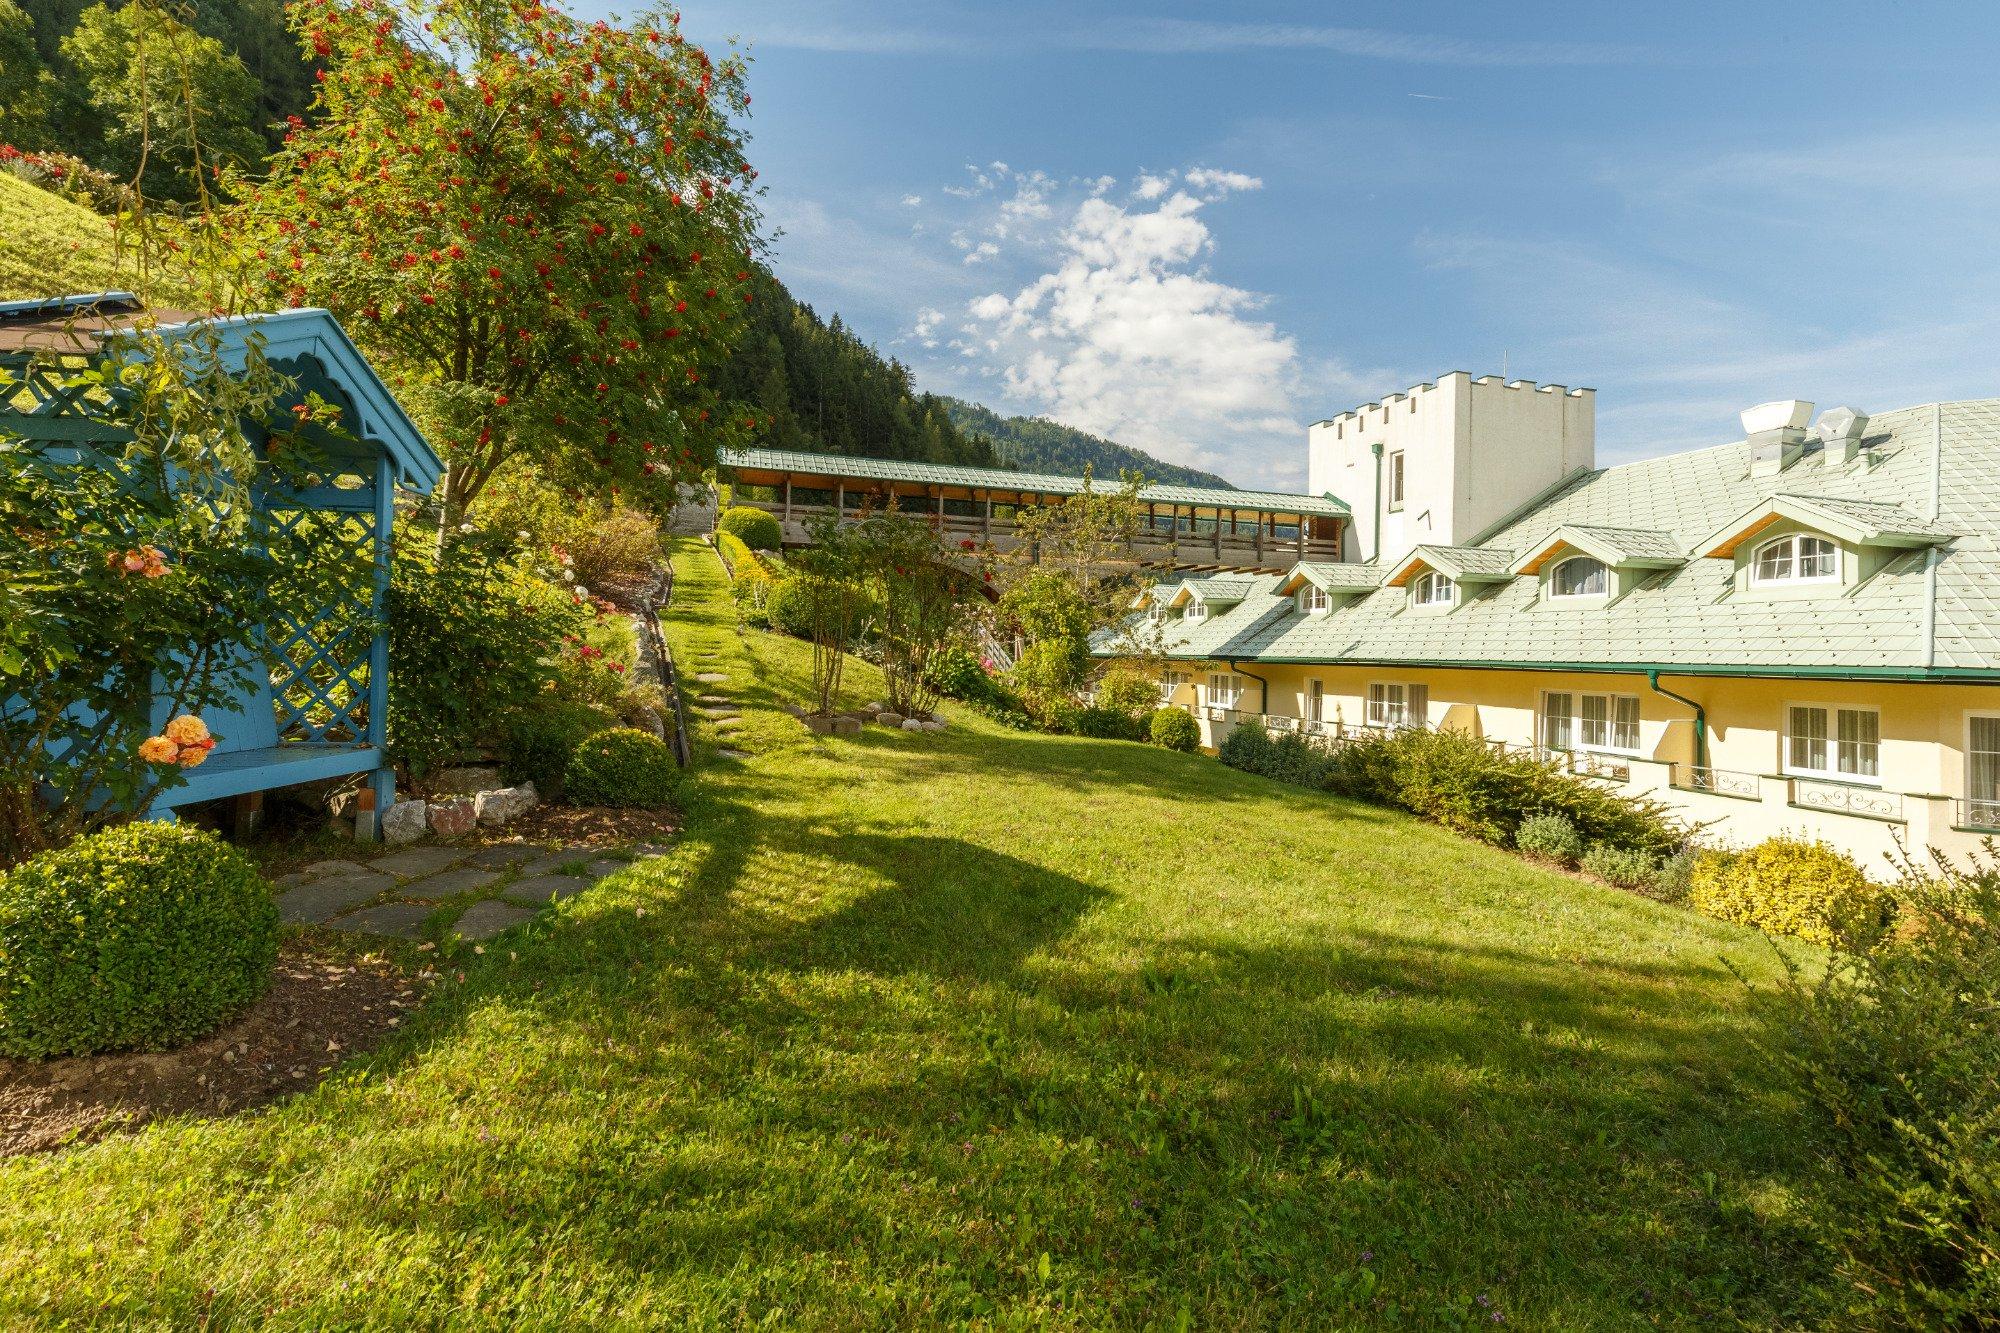 Hotel Ferienschlossl